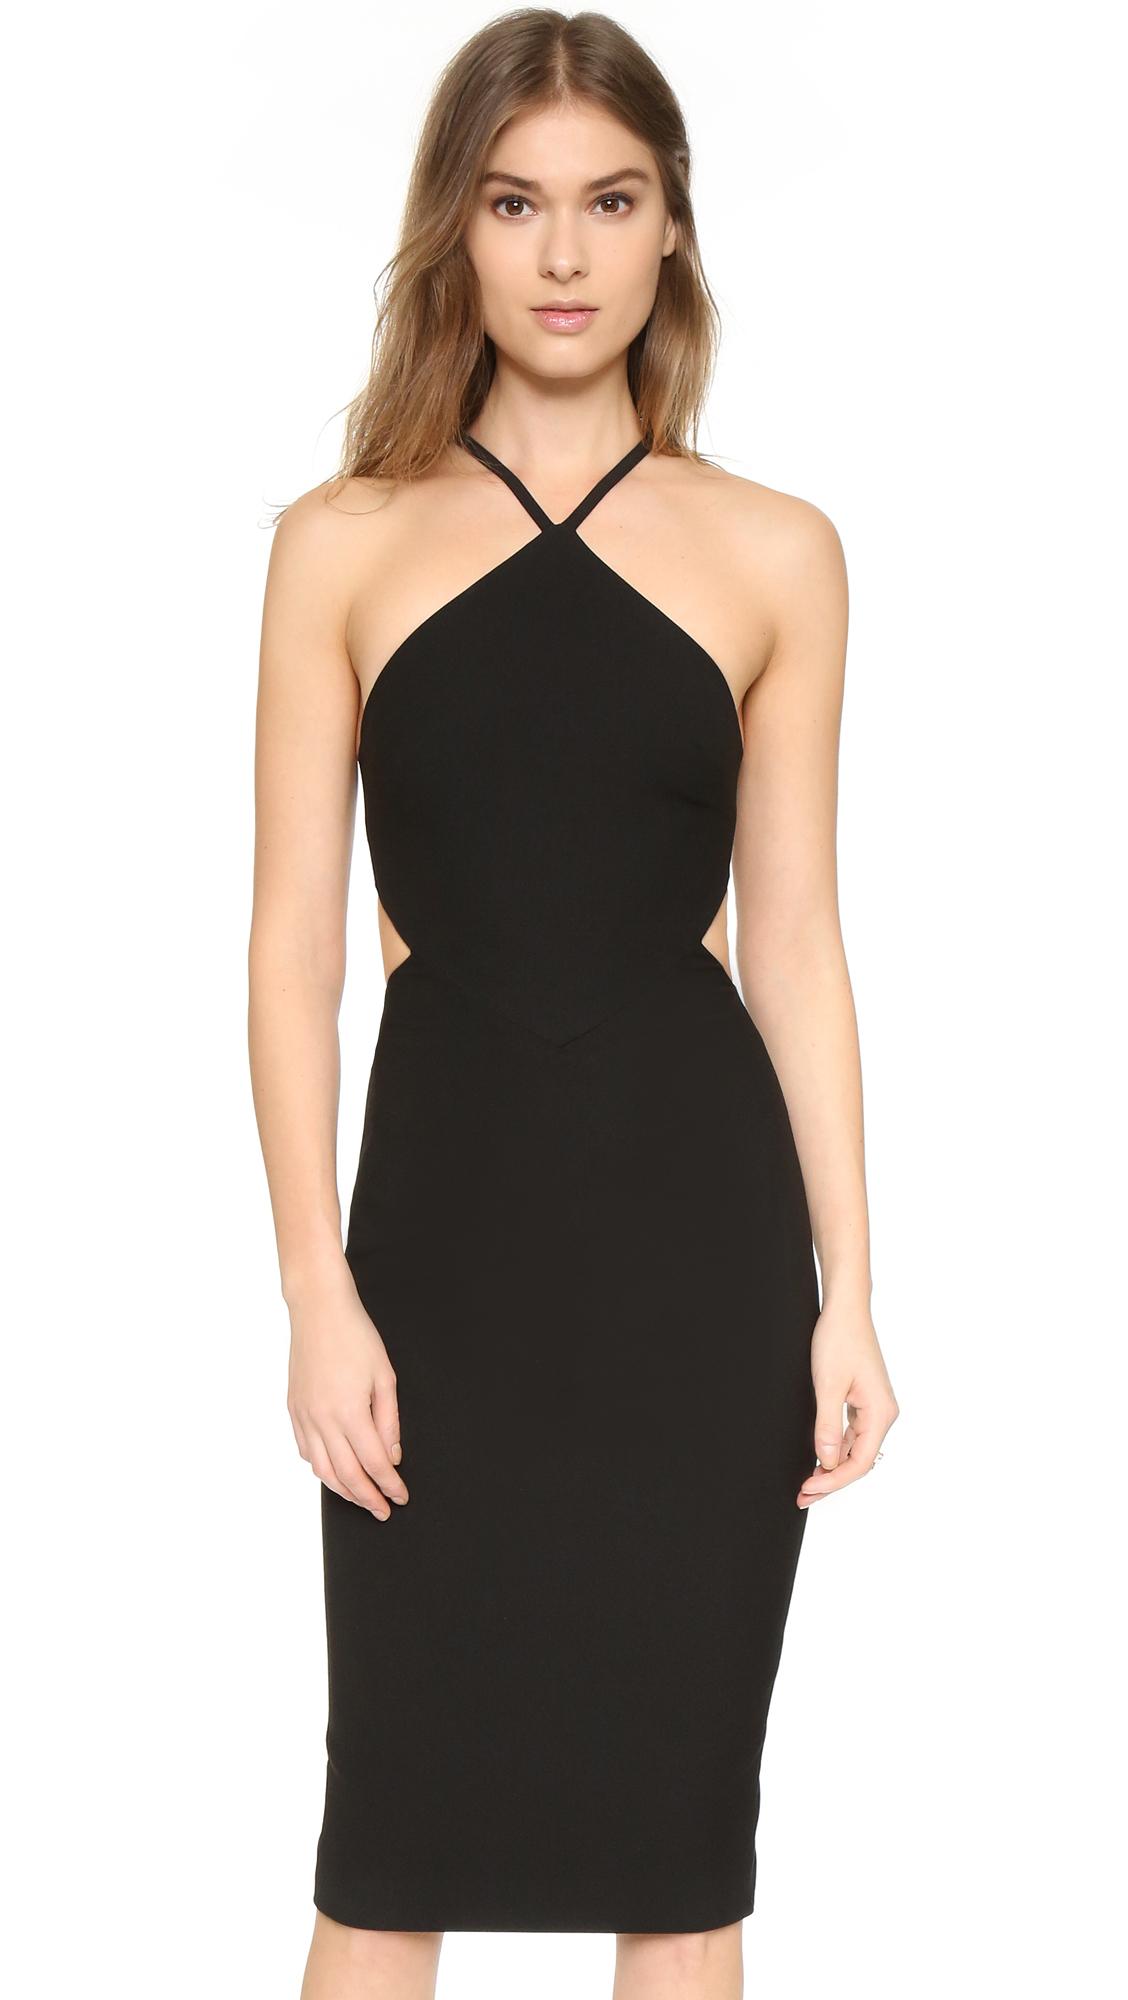 lyst elizabeth and james riza dress in black. Black Bedroom Furniture Sets. Home Design Ideas